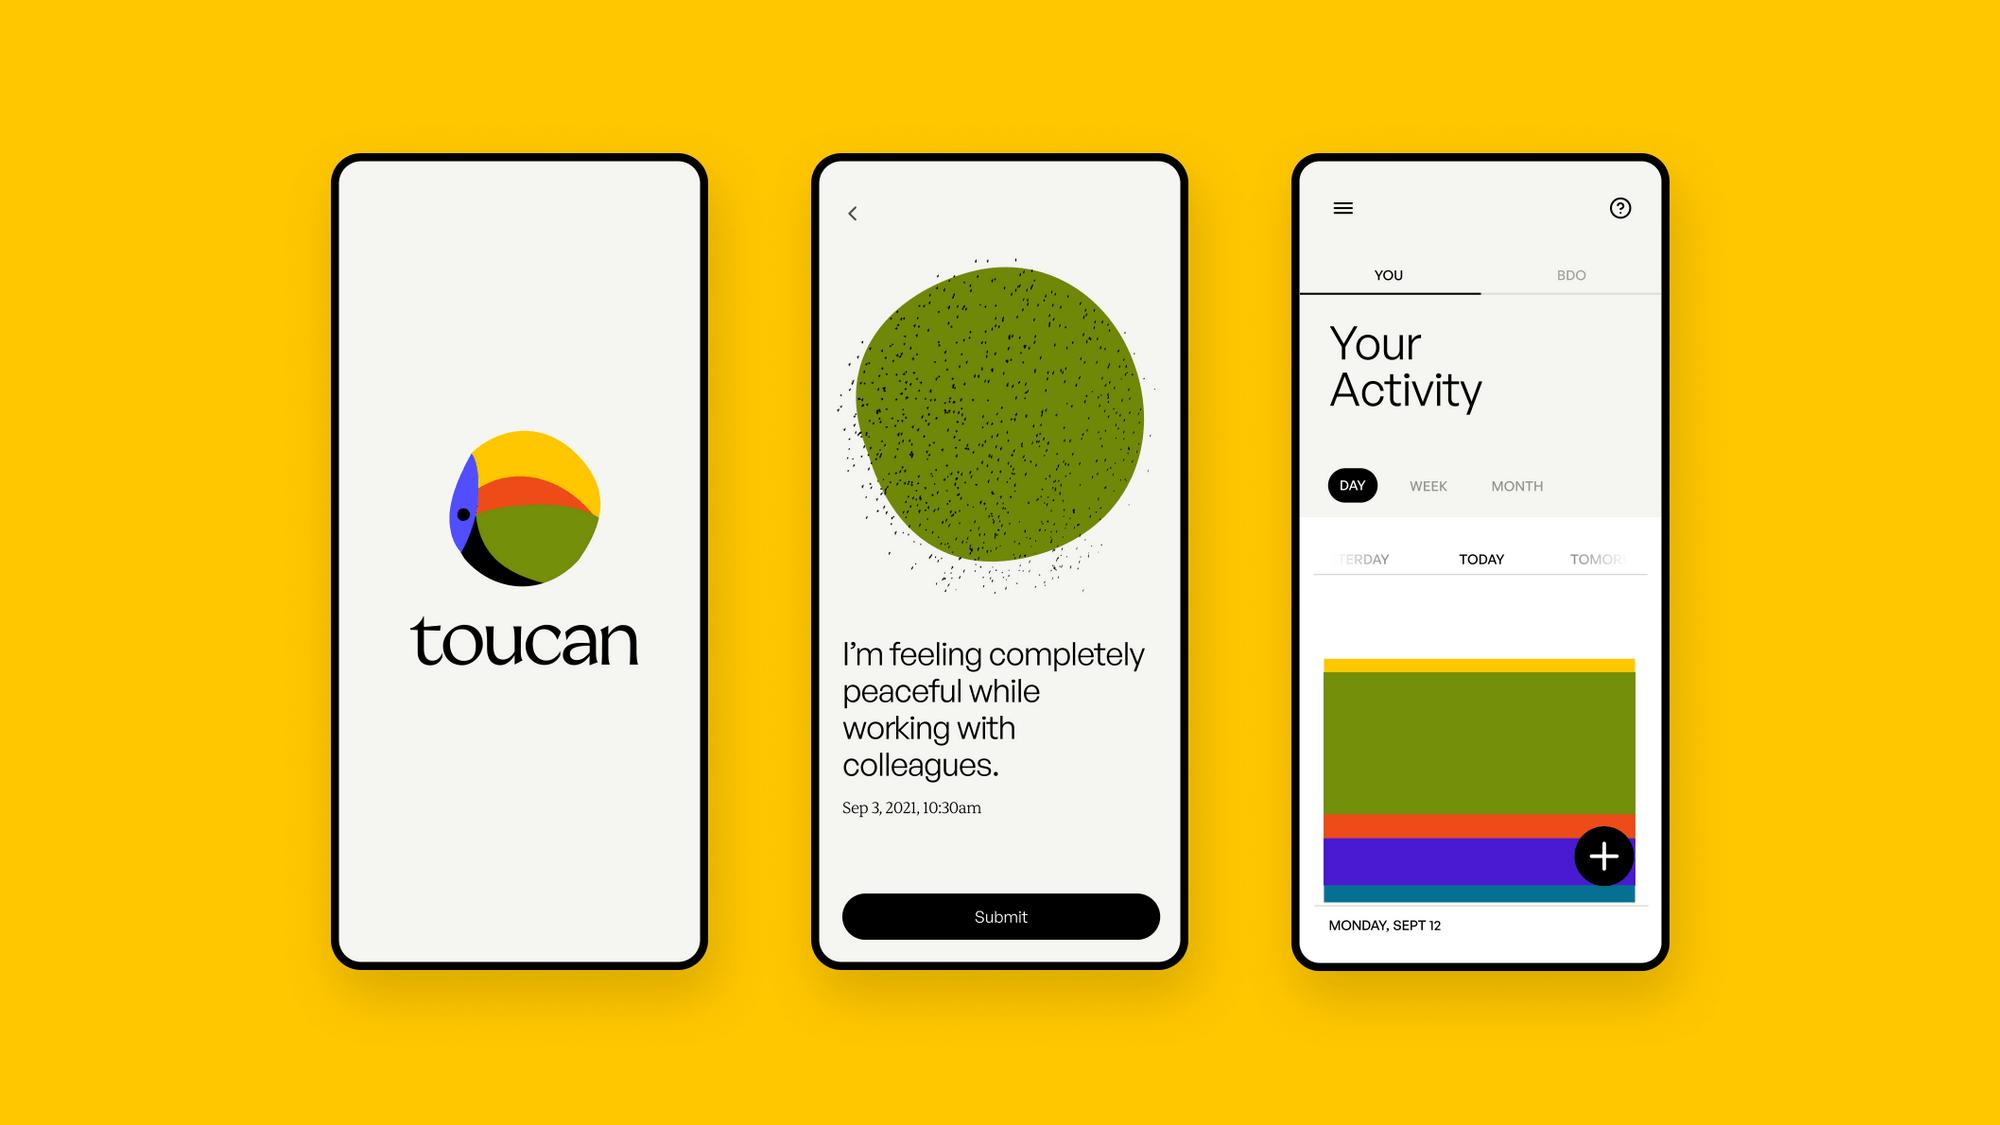 Screenshots of the Toucan app